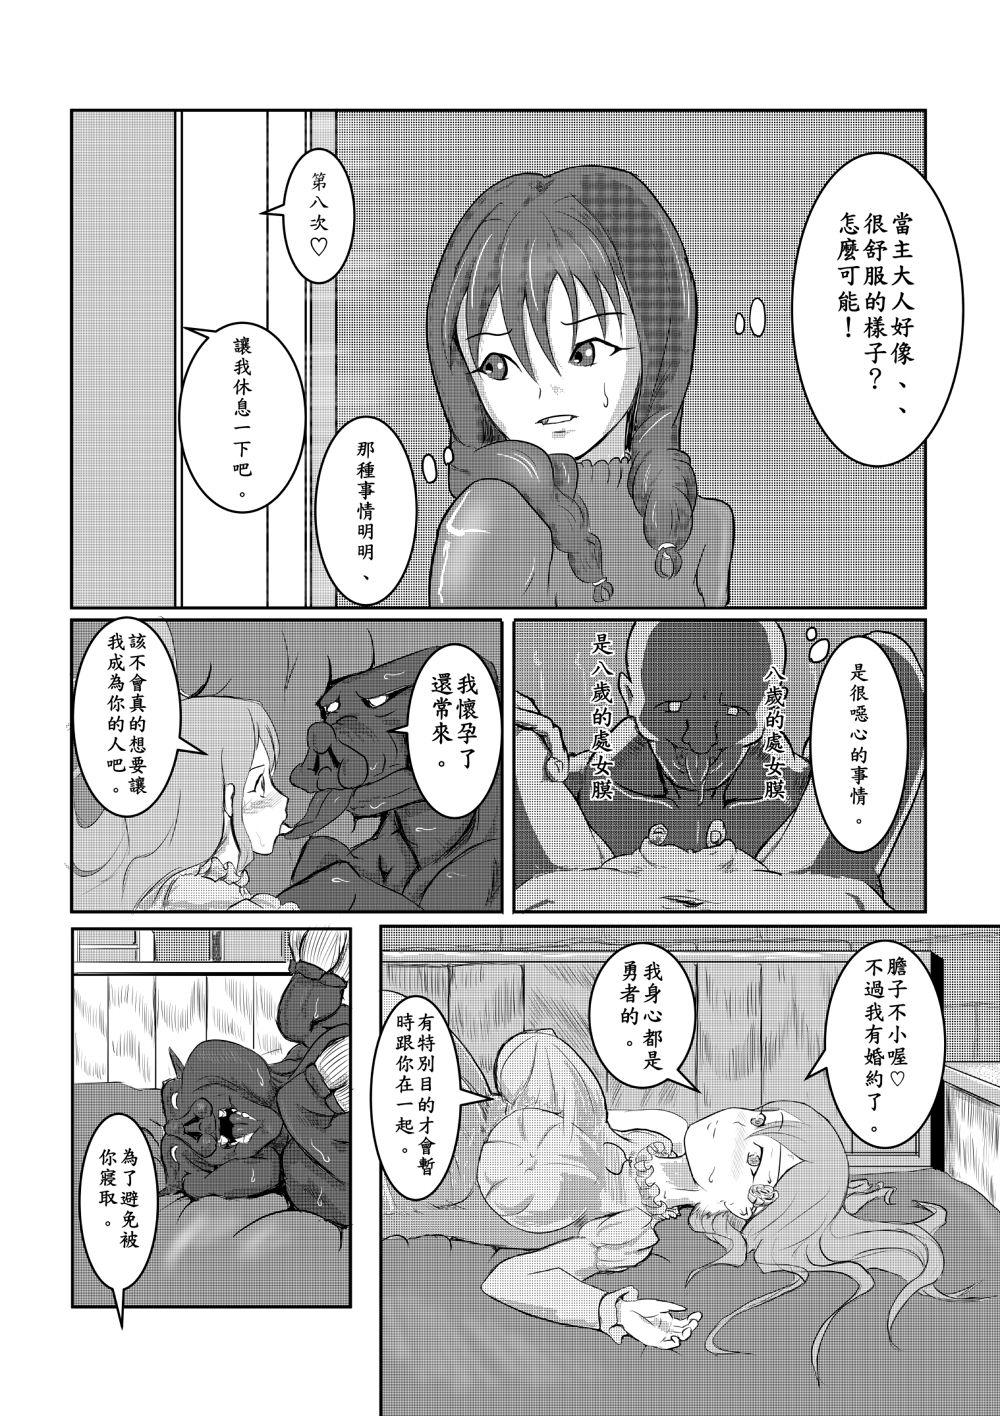 Maou Yuusha - Kachiku Kiki 3 15